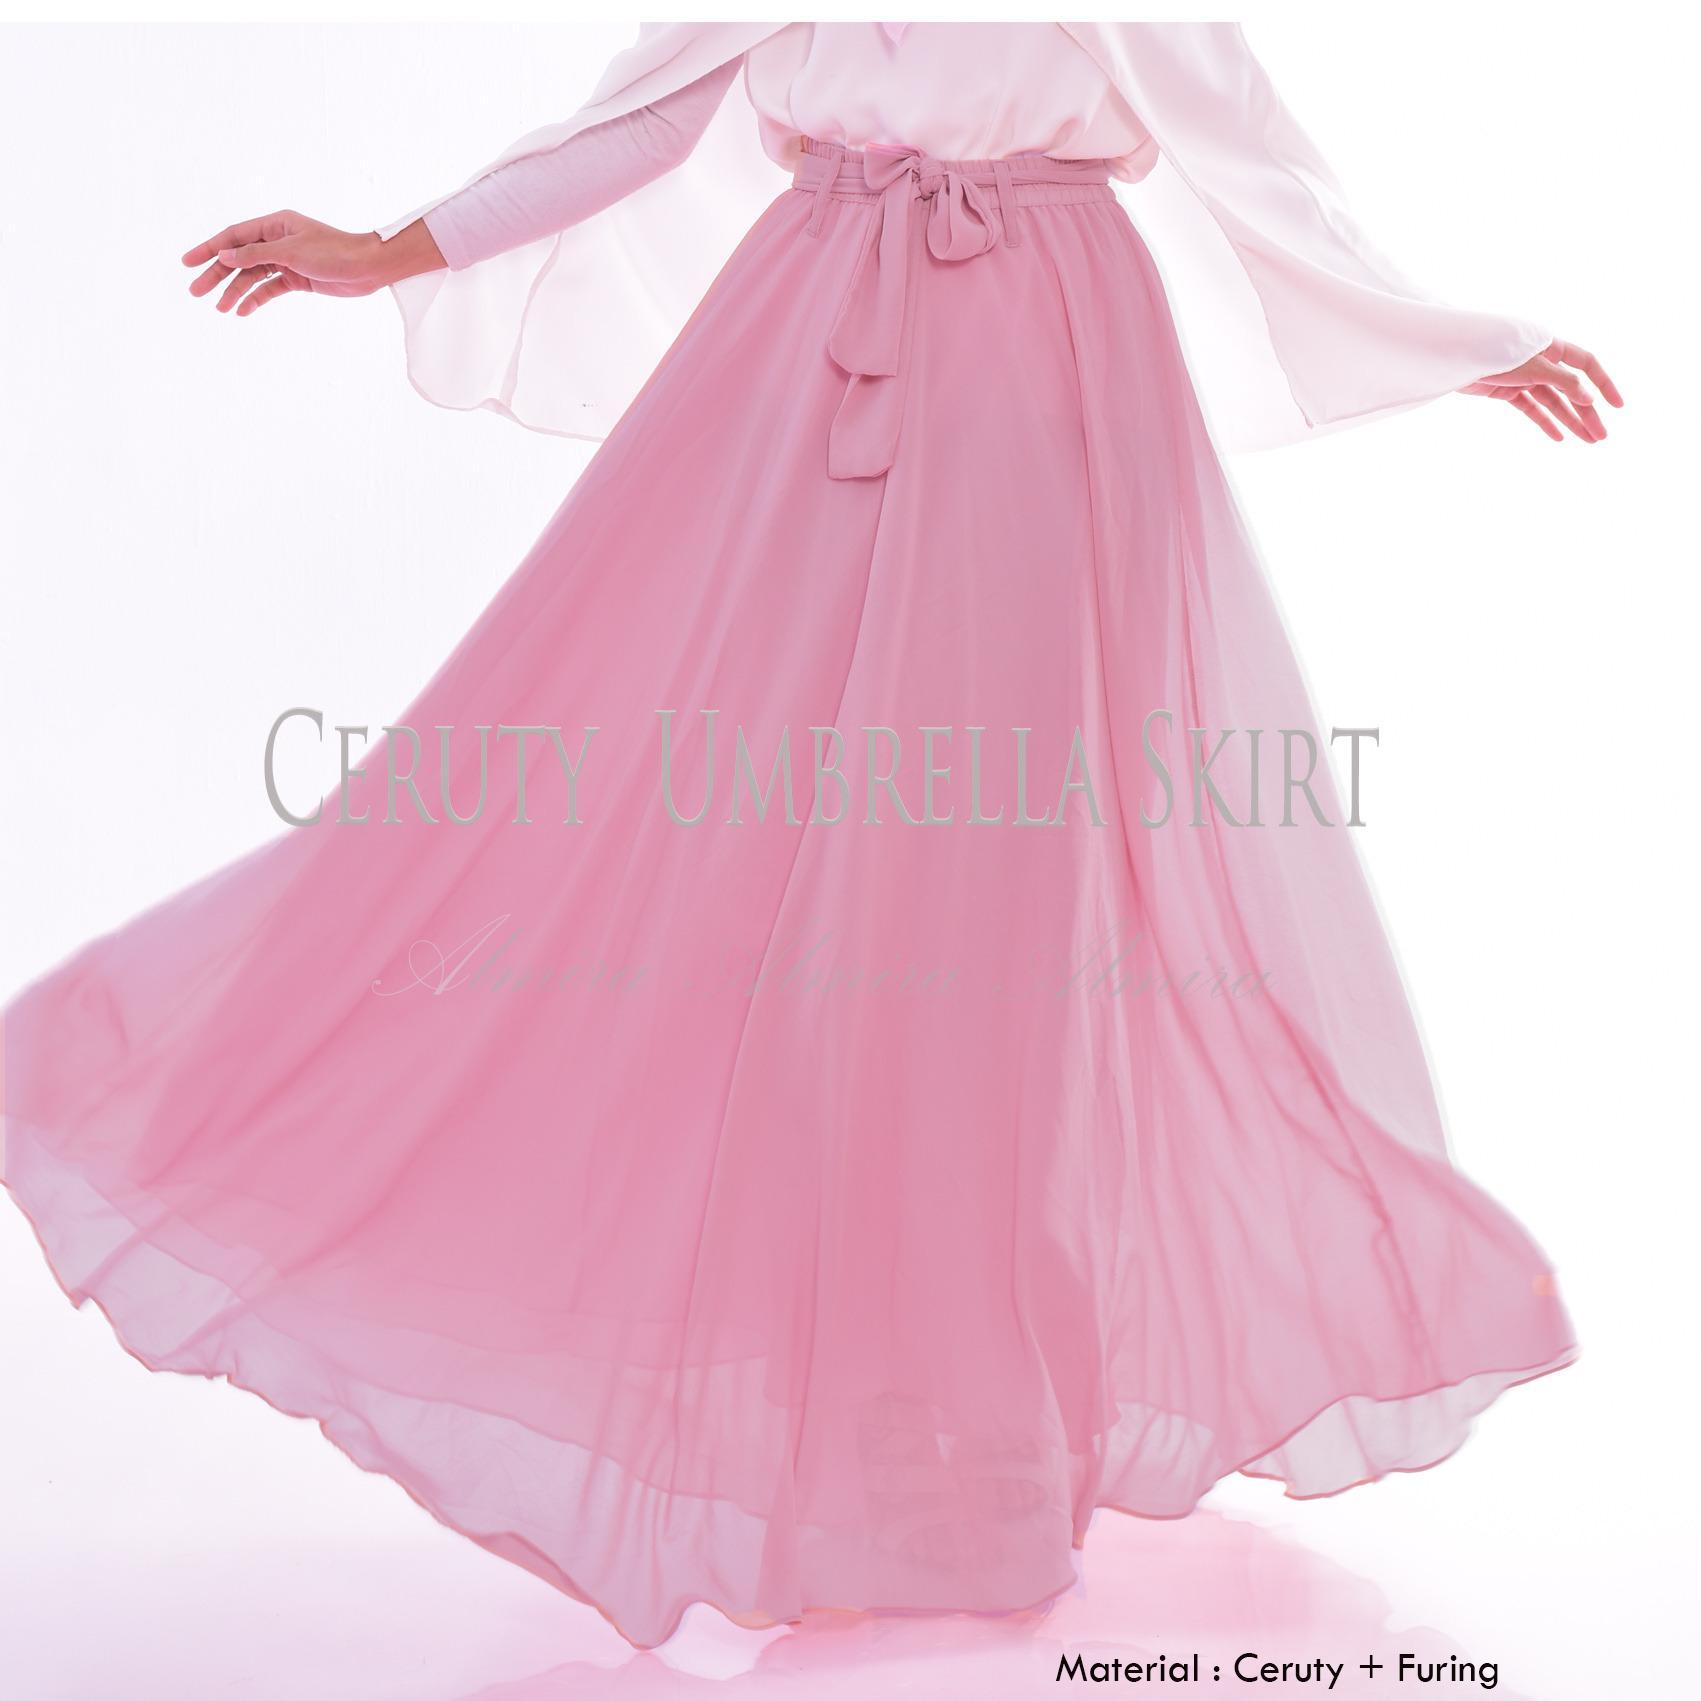 Beli Almira Rok Panjang Wanita Cerutti Dusty Pink Cicilan